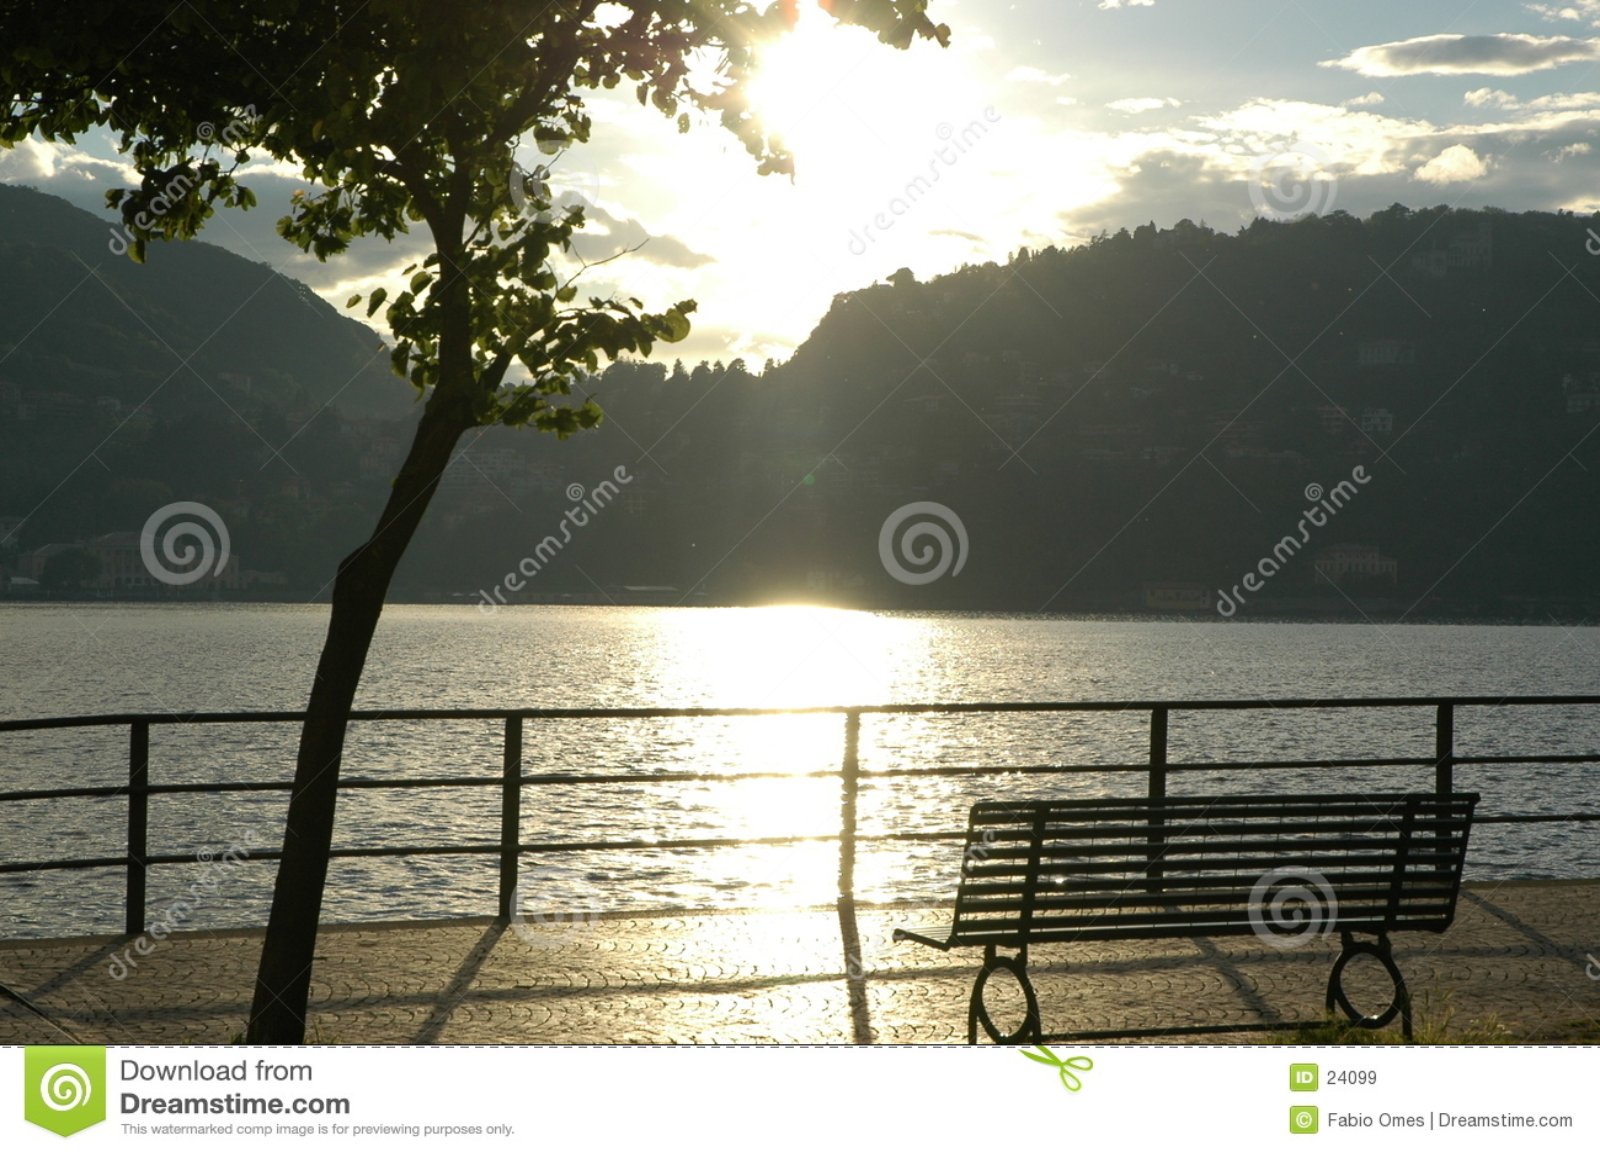 Romantic view in Como lake.